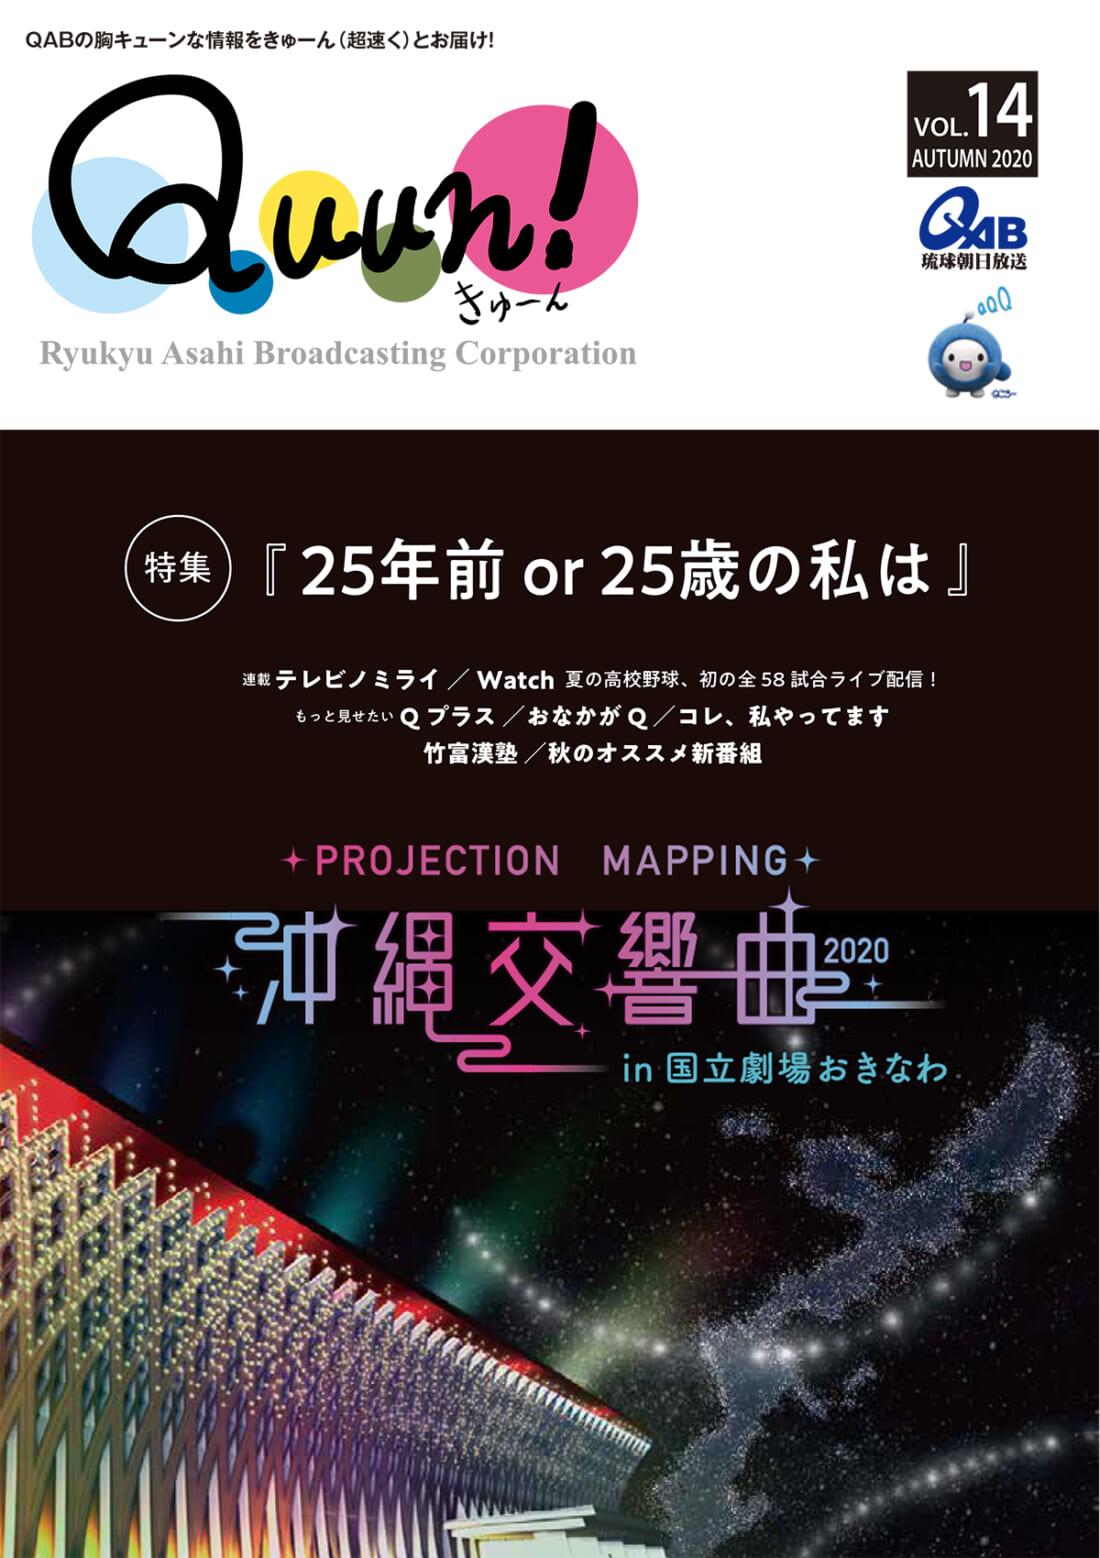 https://www.qab.co.jp/qgoro/wp-content/uploads/quun_1401-1100x1558.jpg